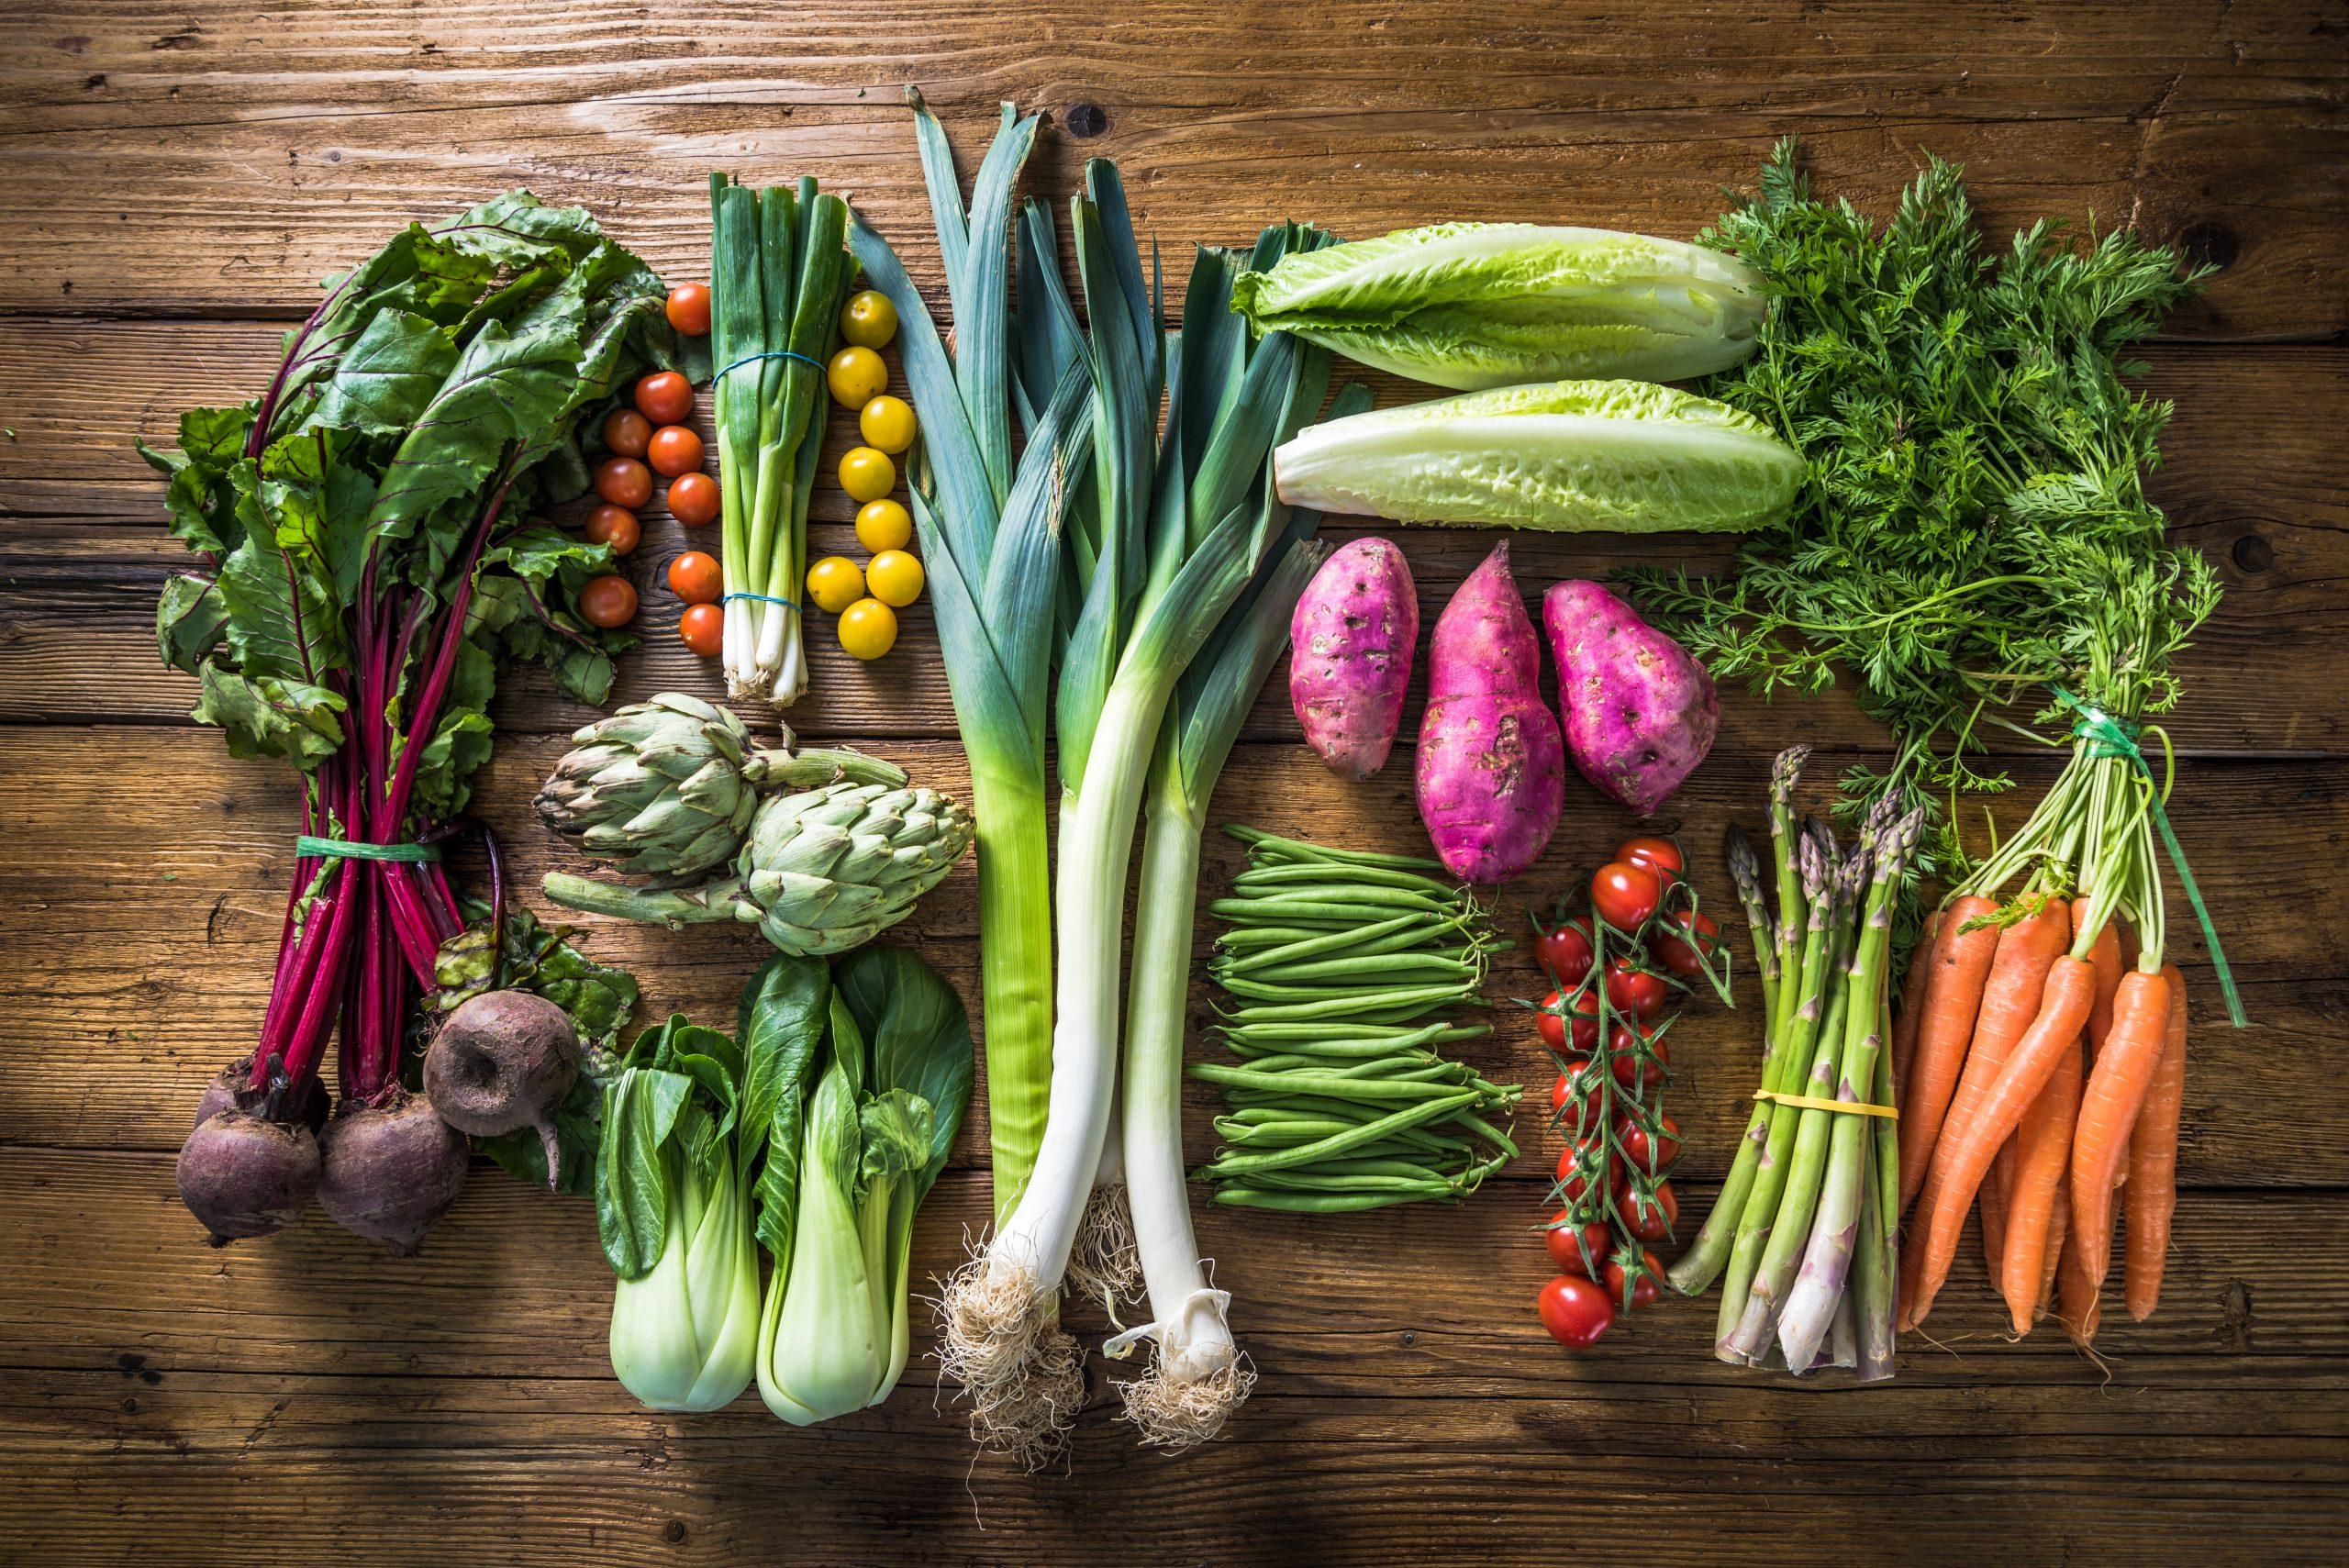 Exposition of fresh organic vegetables on wooden table. Beet, green onion, tomato, artichoke, bok choy, leek, lettuce salad, purple potato, green beans, asparagus, carrot and coriander.